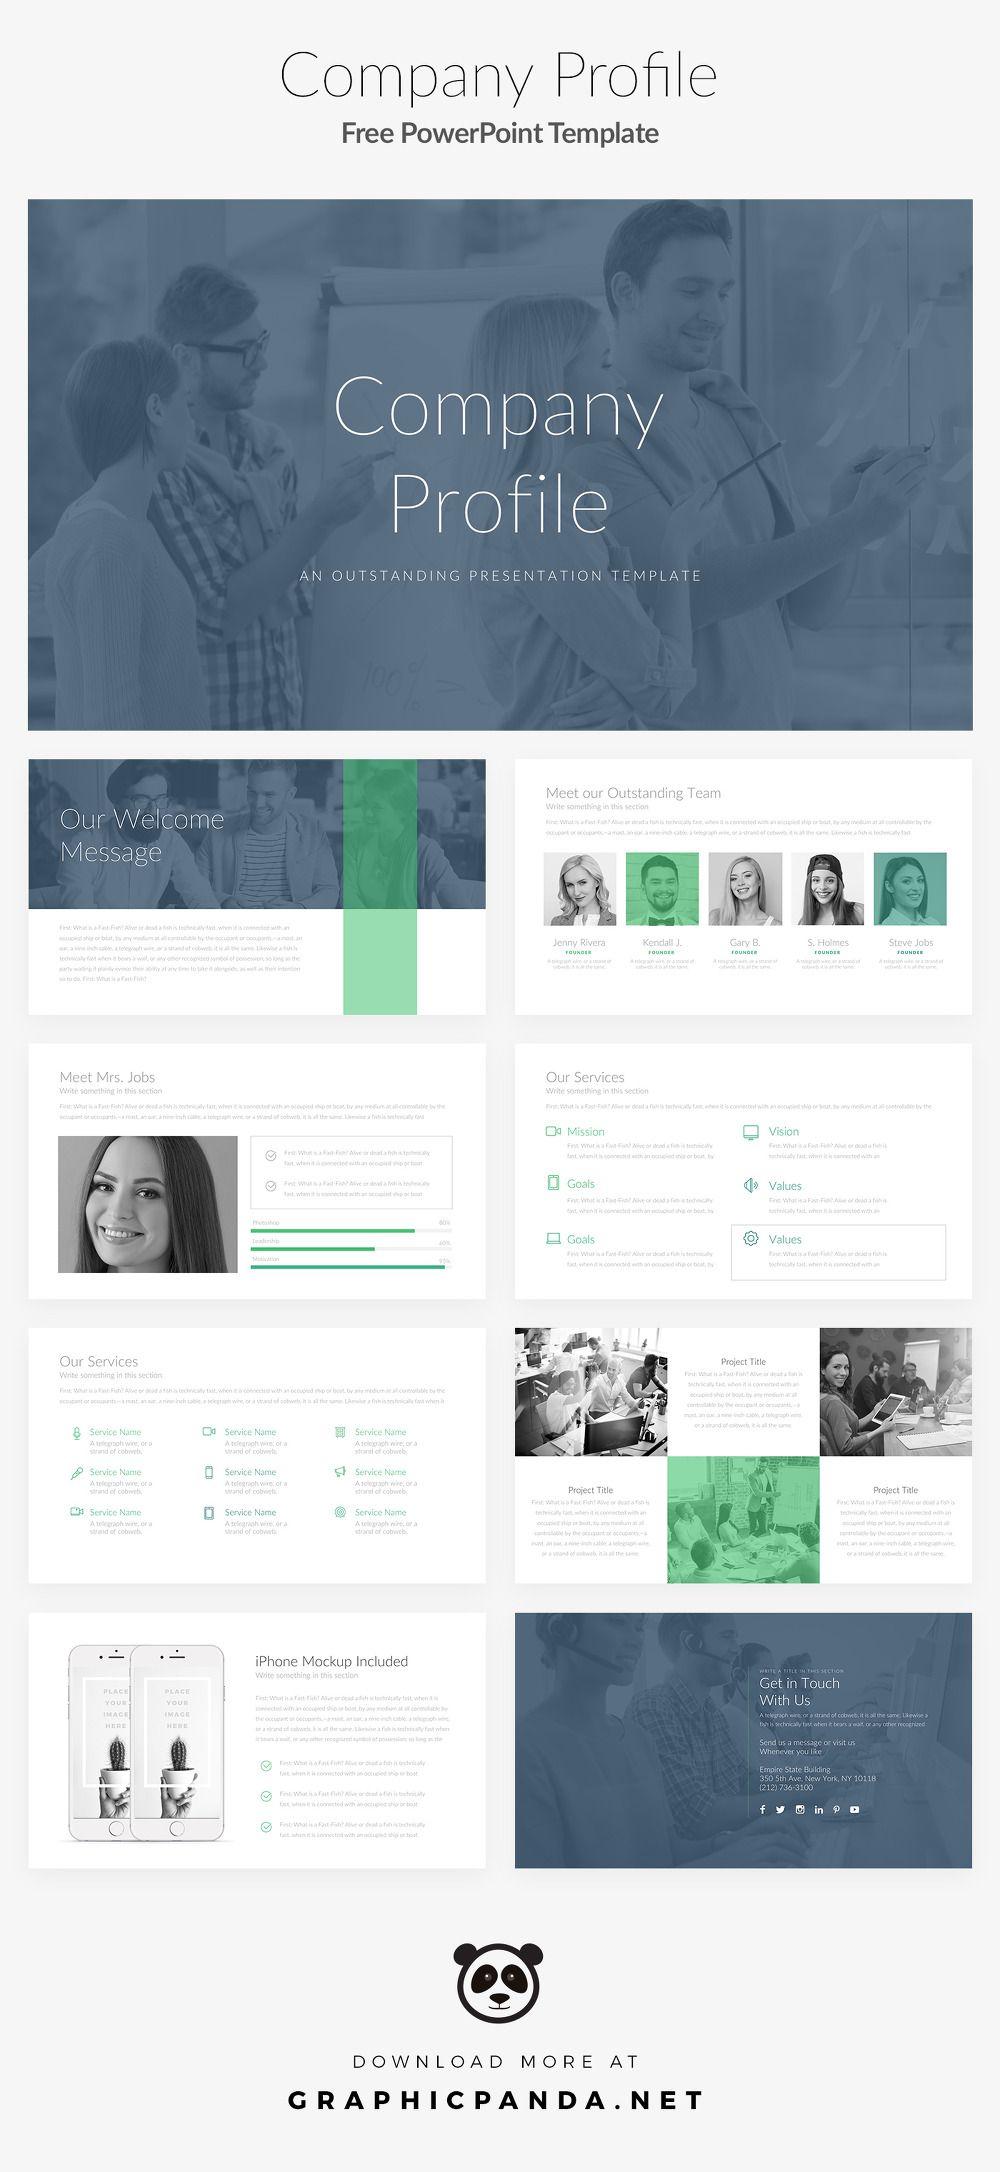 ppt free company profile ppt free company profile powerpoint template ppt toneelgroepblik Choice Image